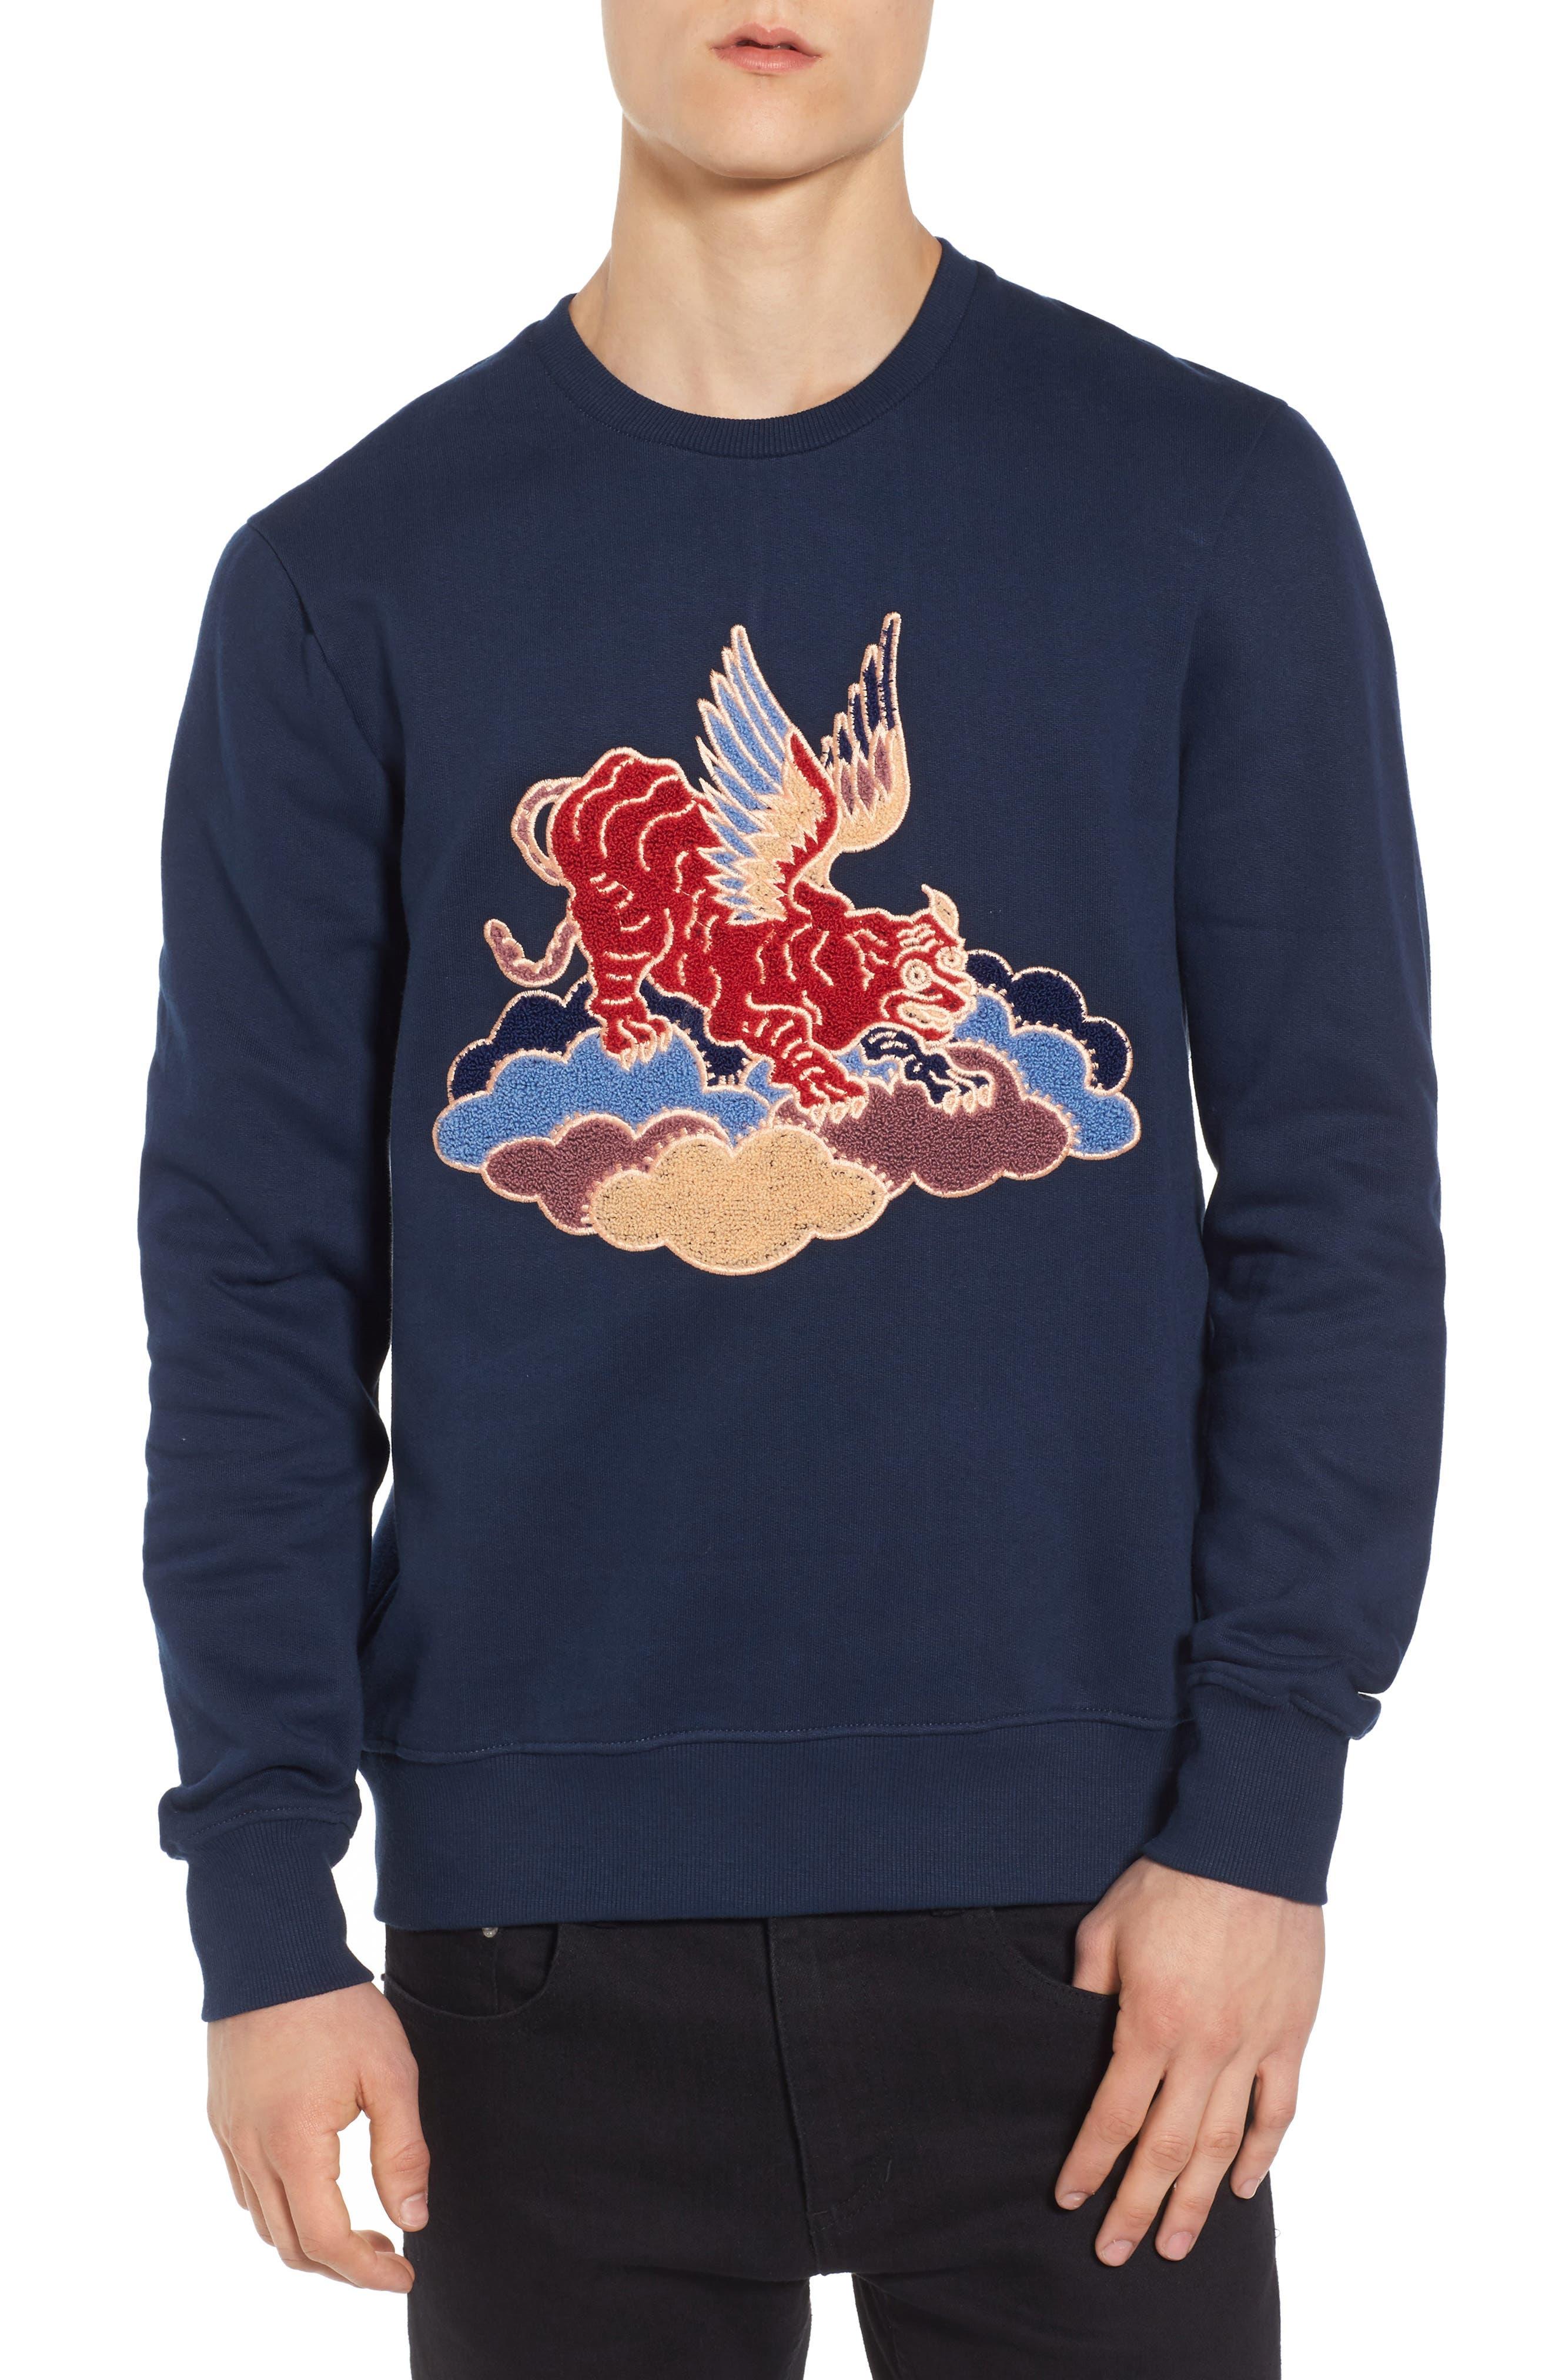 Main Image - ELEVENPARIS Nokat Appliqué Sweatshirt